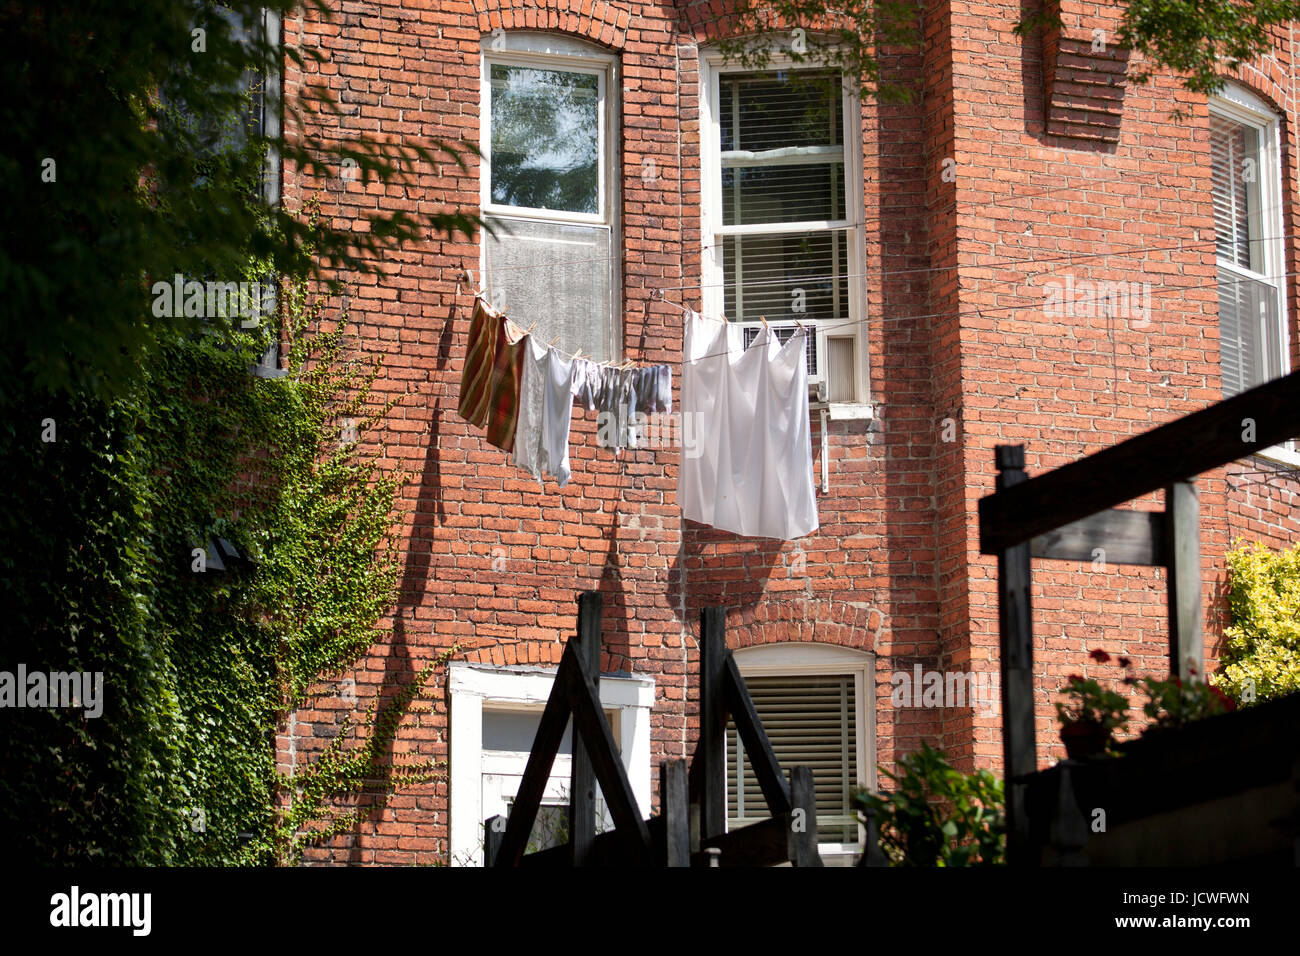 Laundry drying on clothesline - USA - Stock Image